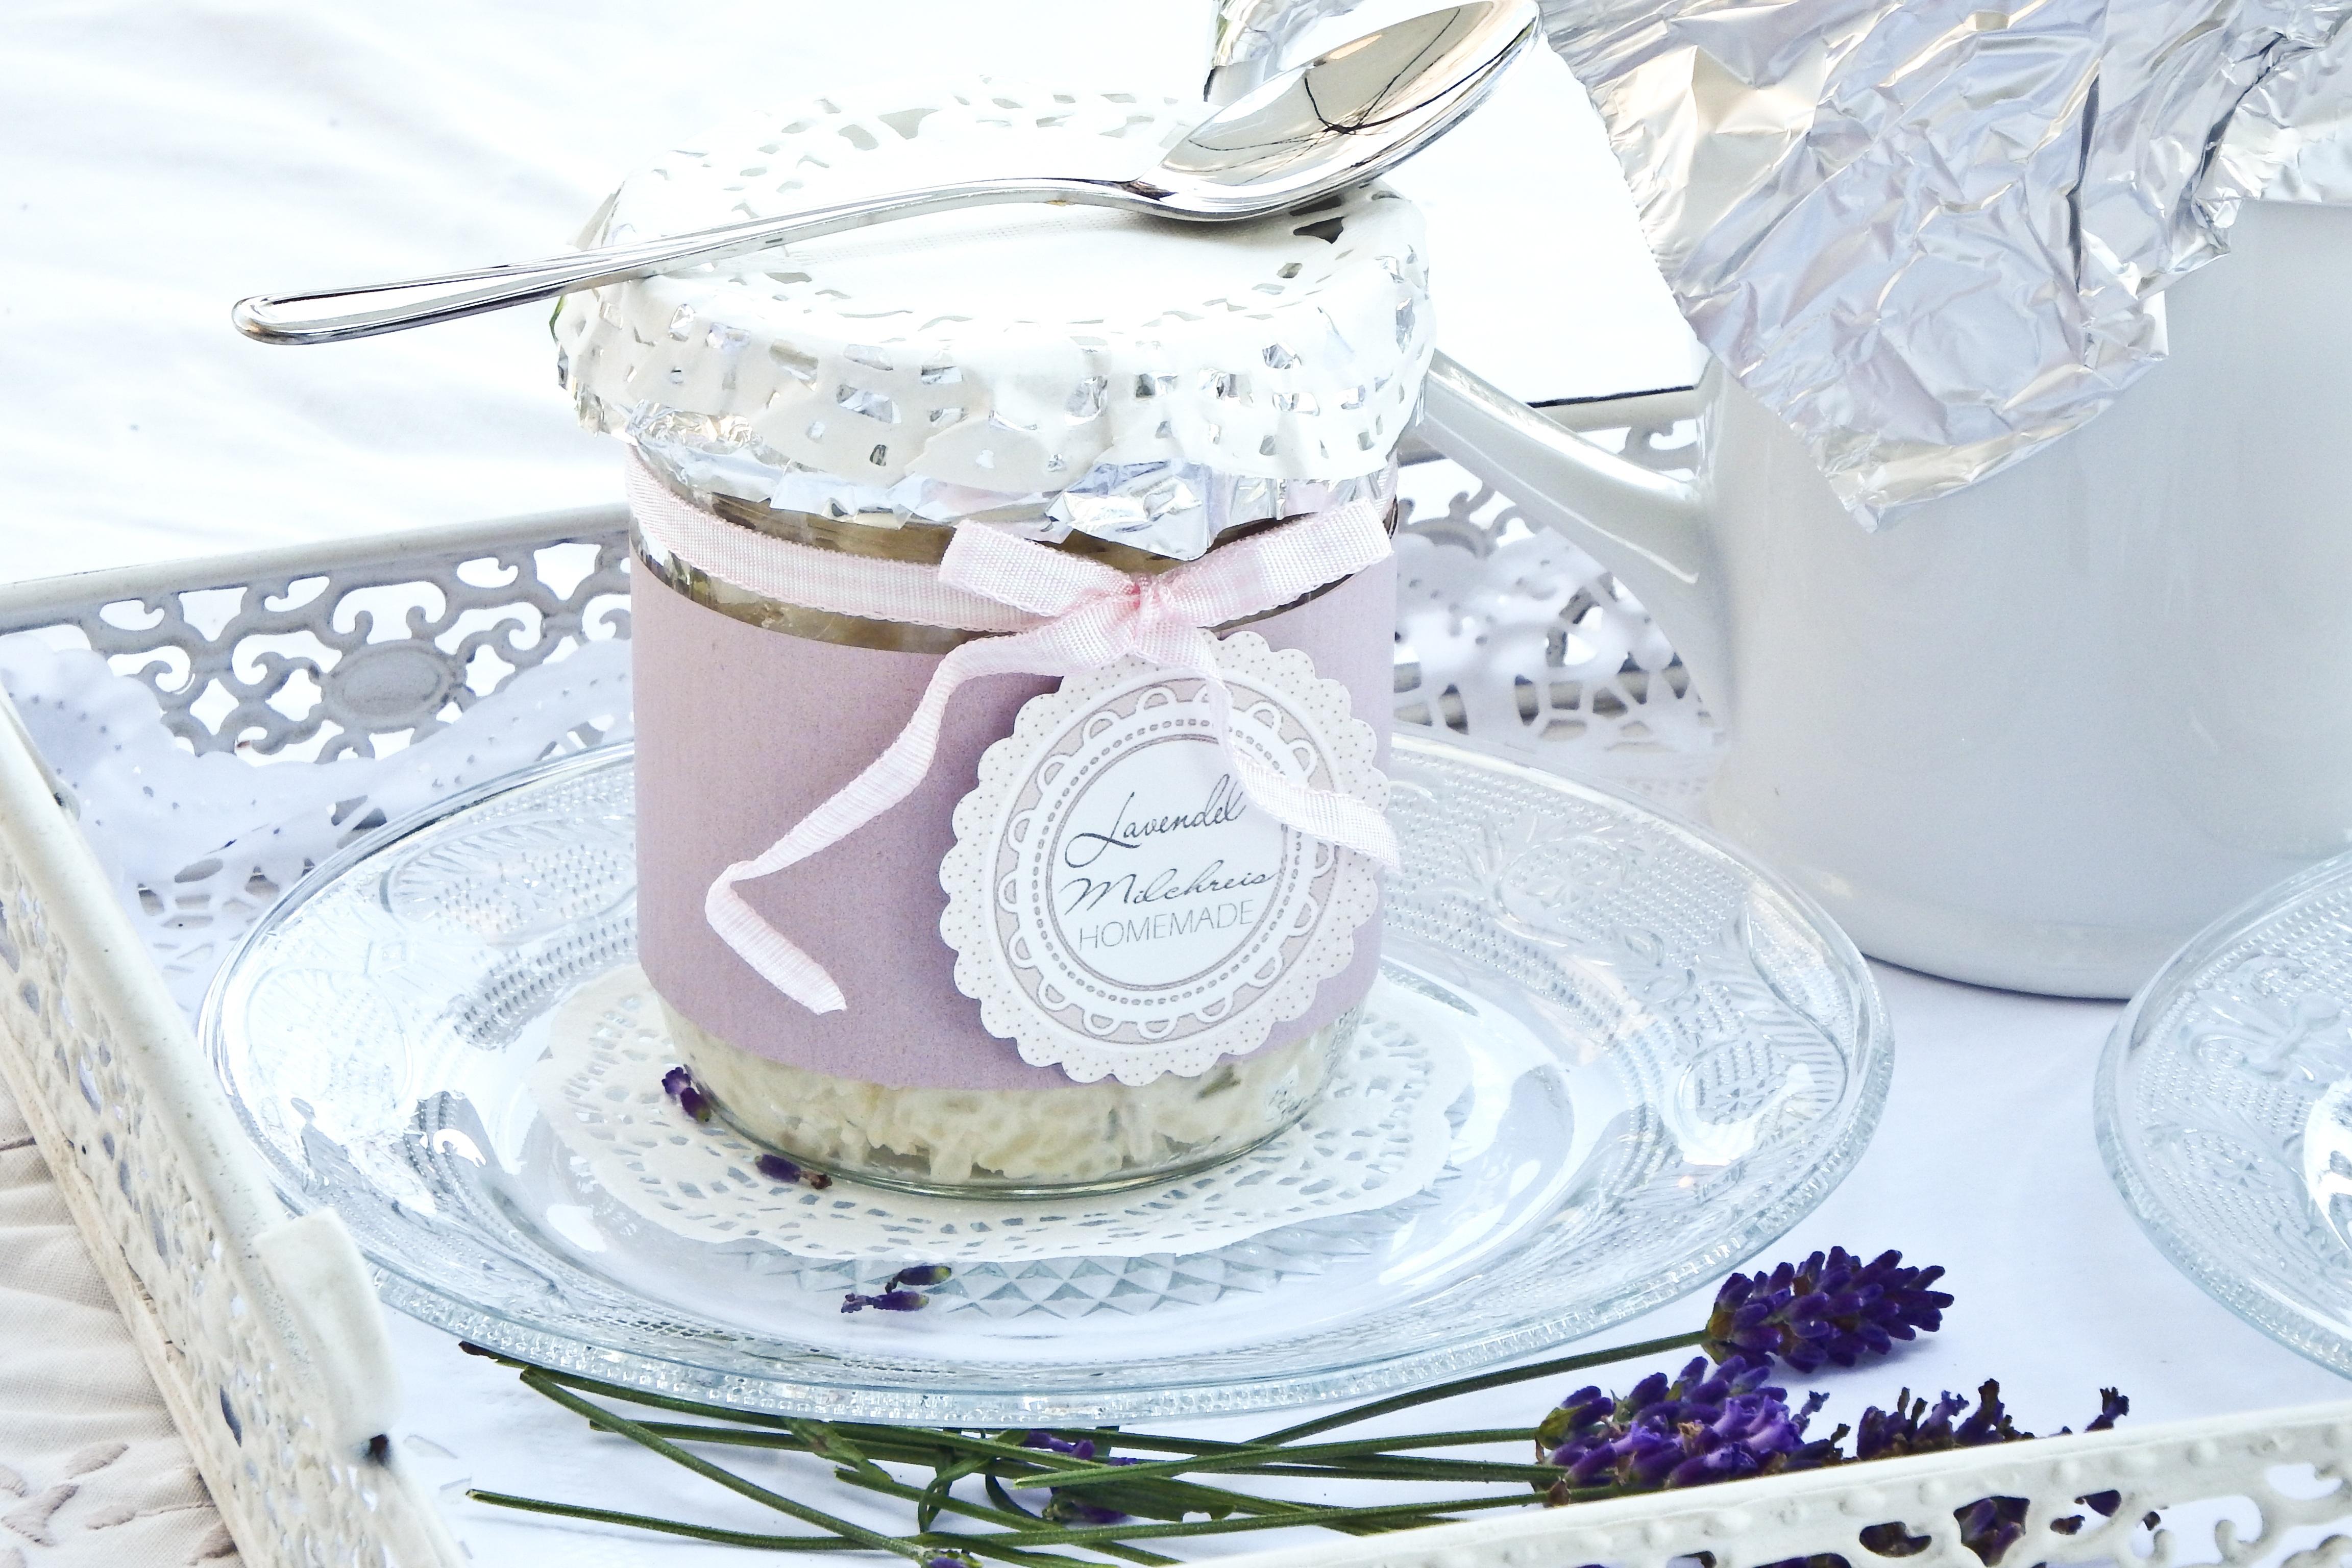 Hintergrundbilder Lebensmittel Lavendel Fruhstuck Dessert Bank